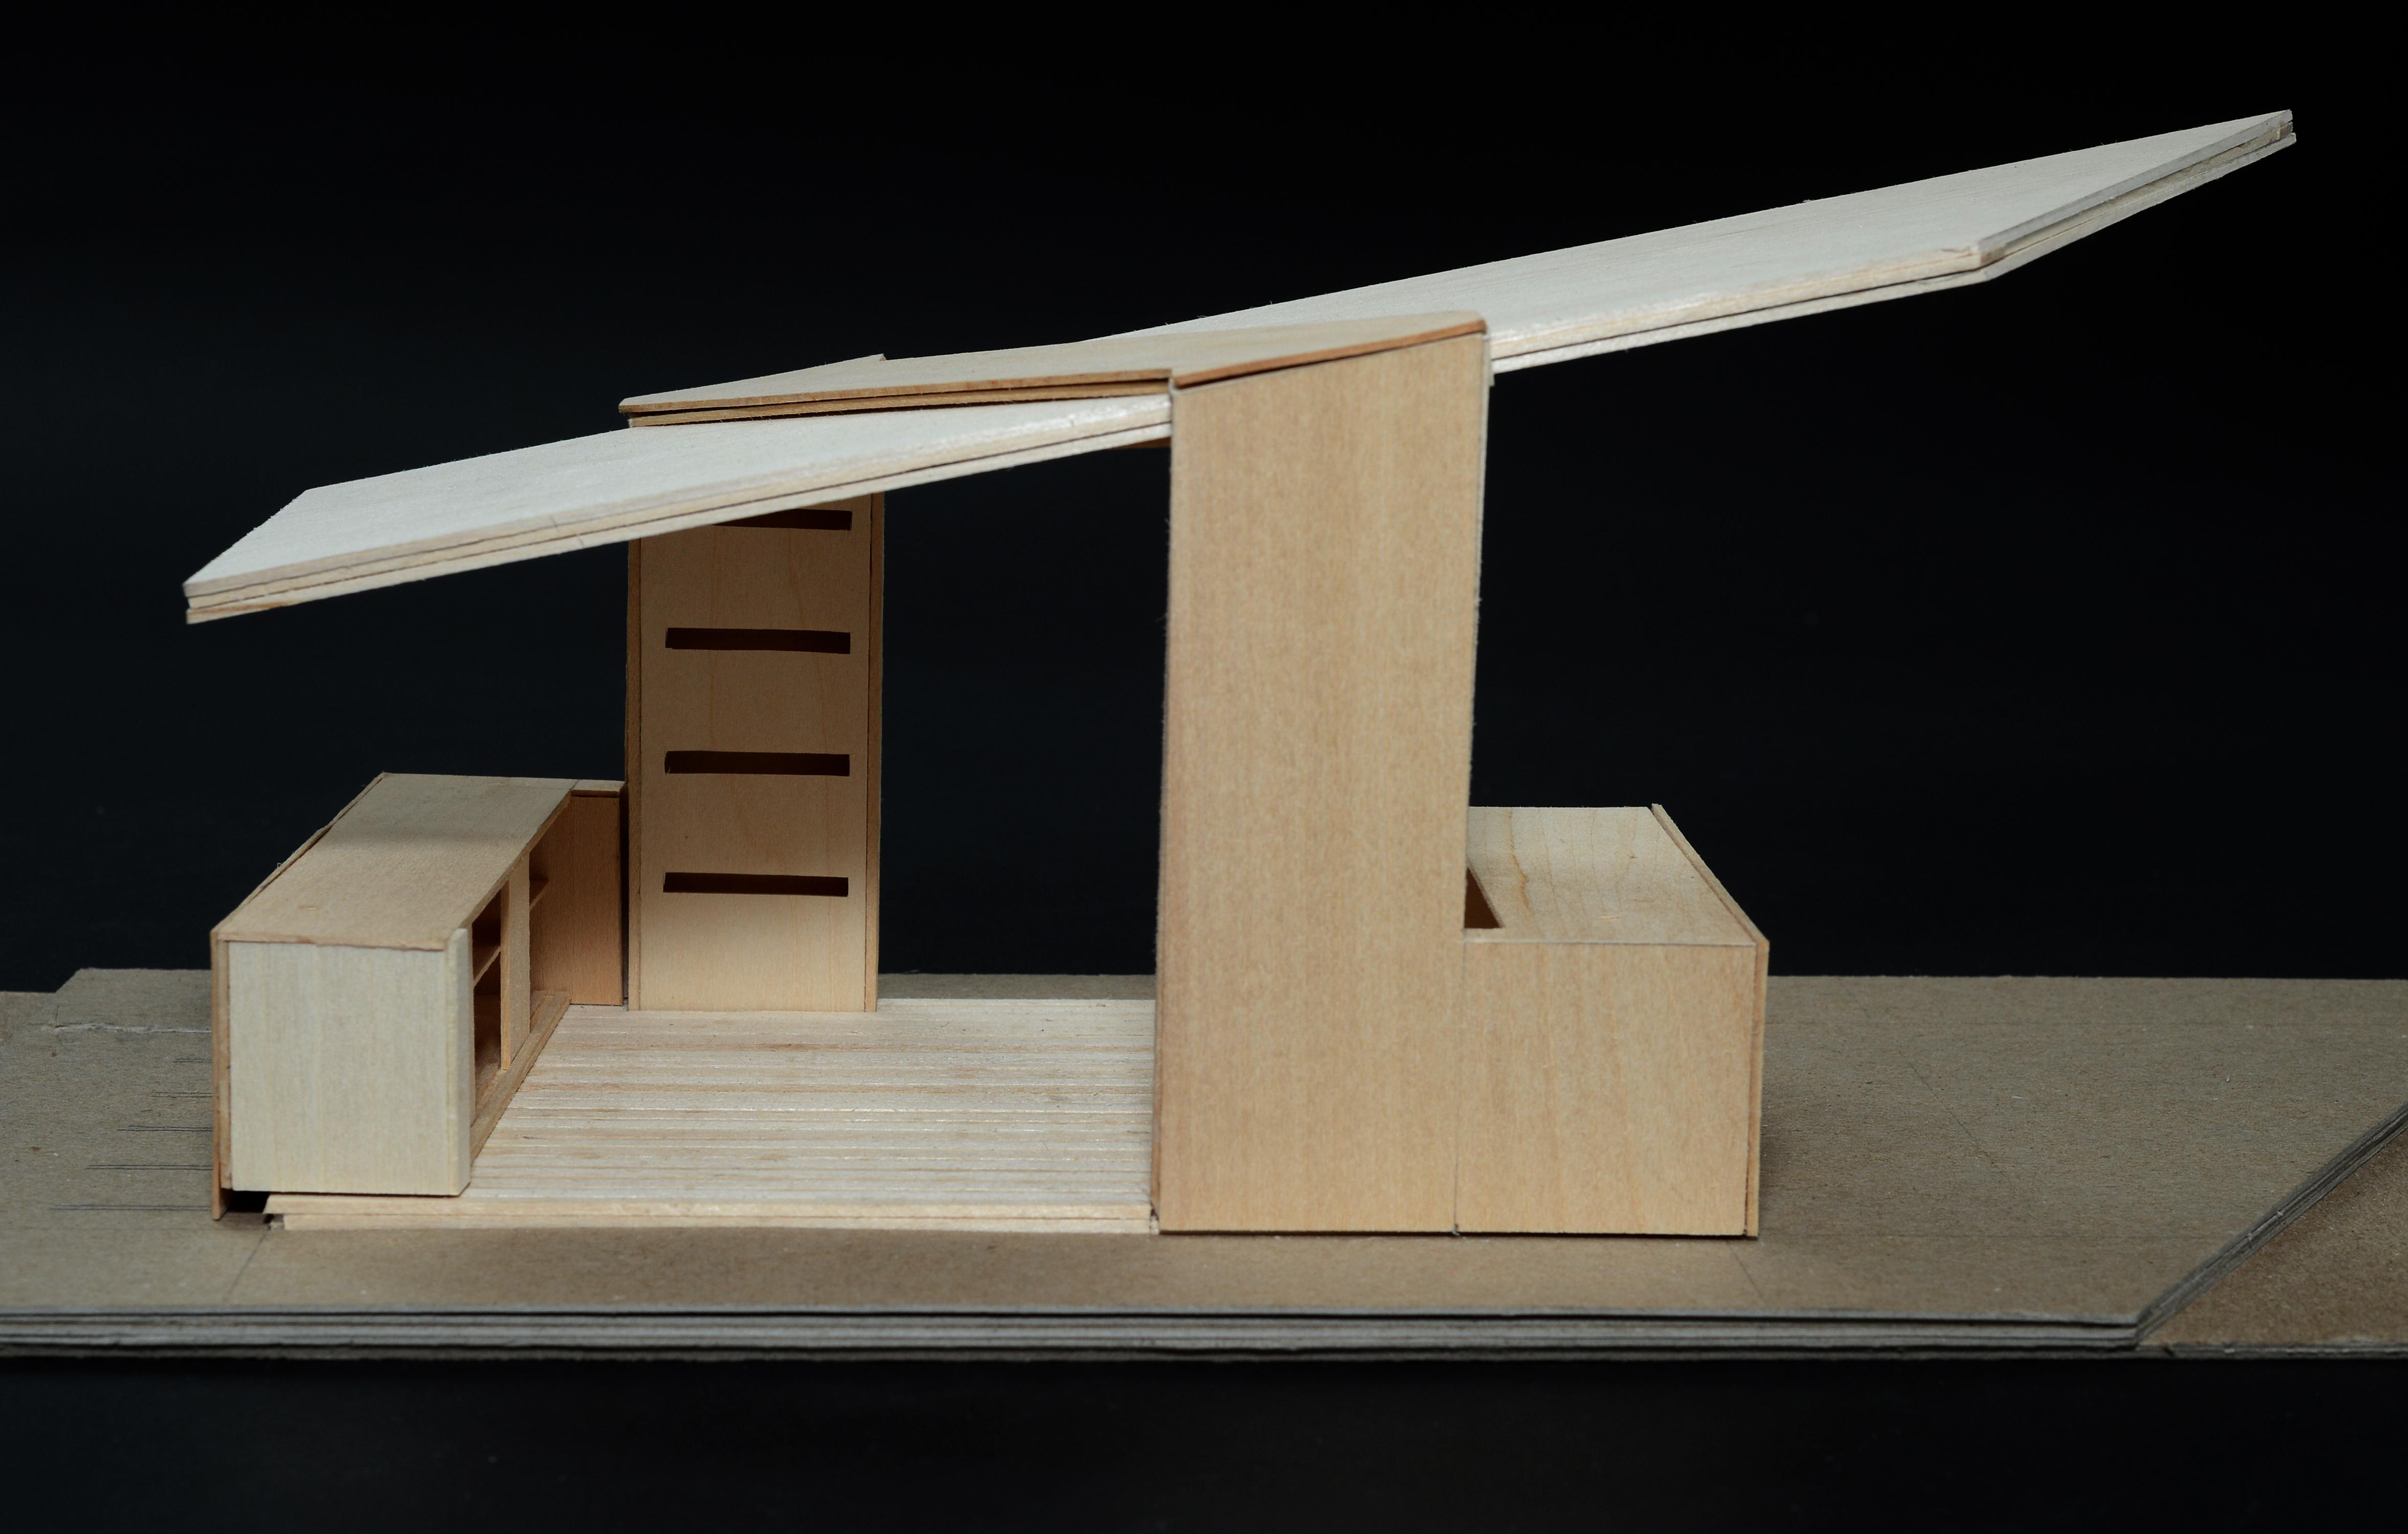 Summer Program - College Experience | Julian Krinsky: Architecture - Summer at Penn